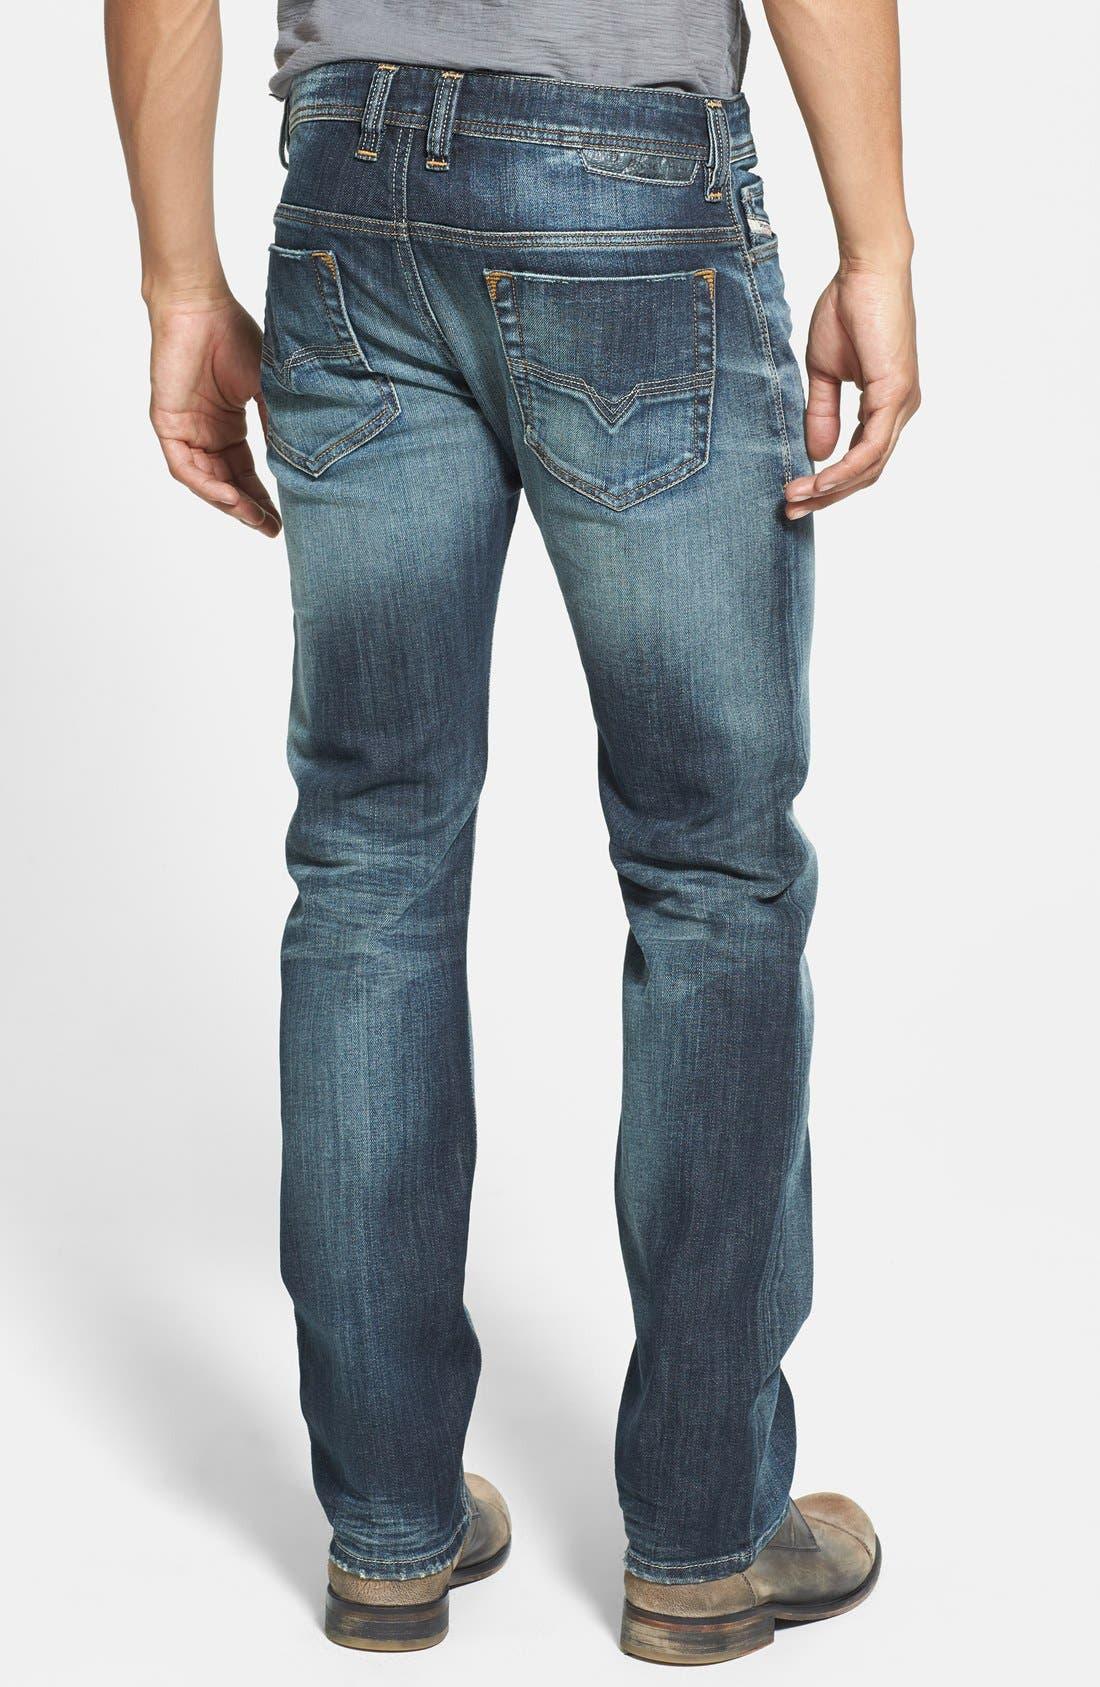 Safado Slim Fit Jeans,                             Alternate thumbnail 6, color,                             400